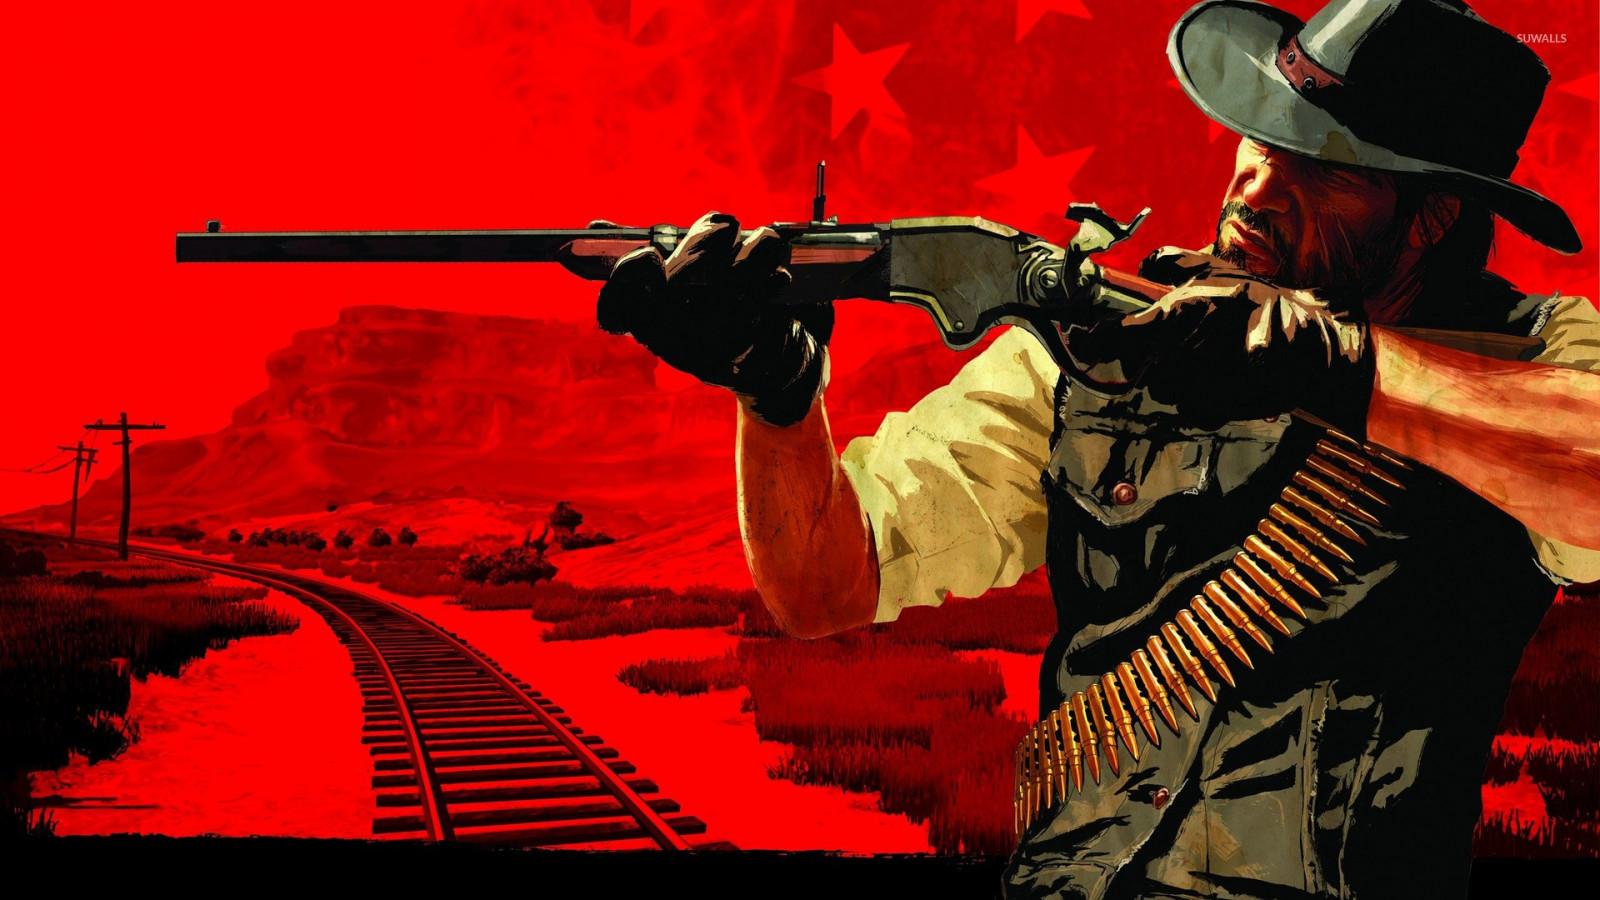 Wallpaper : digital art, Video Game Art, video games, Red ...